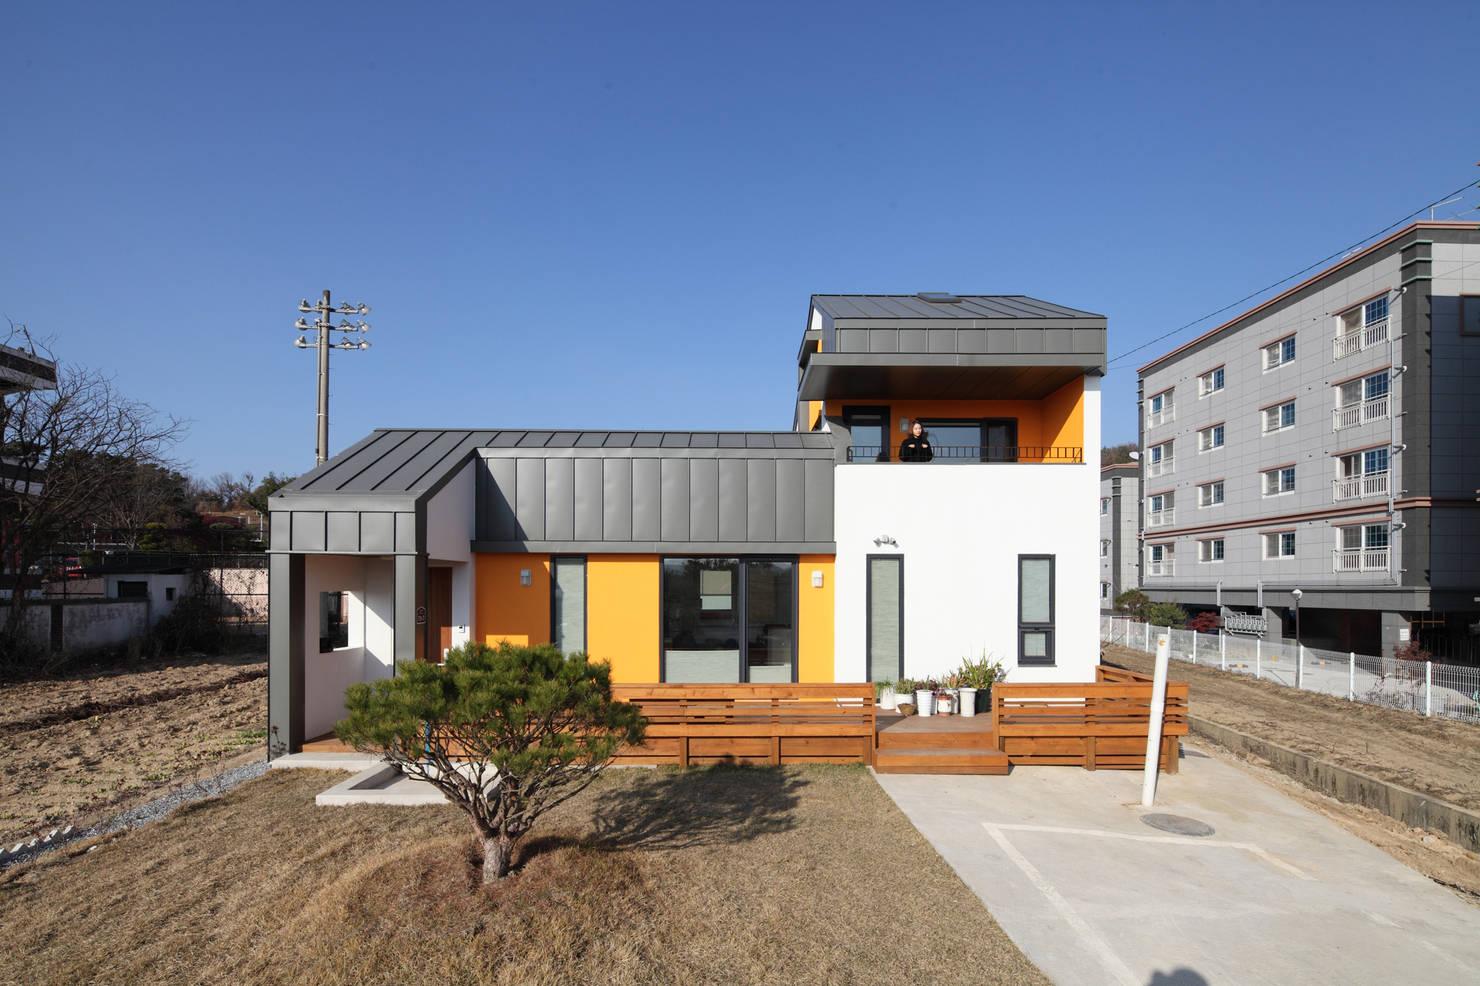 The modular home of hidden surprises